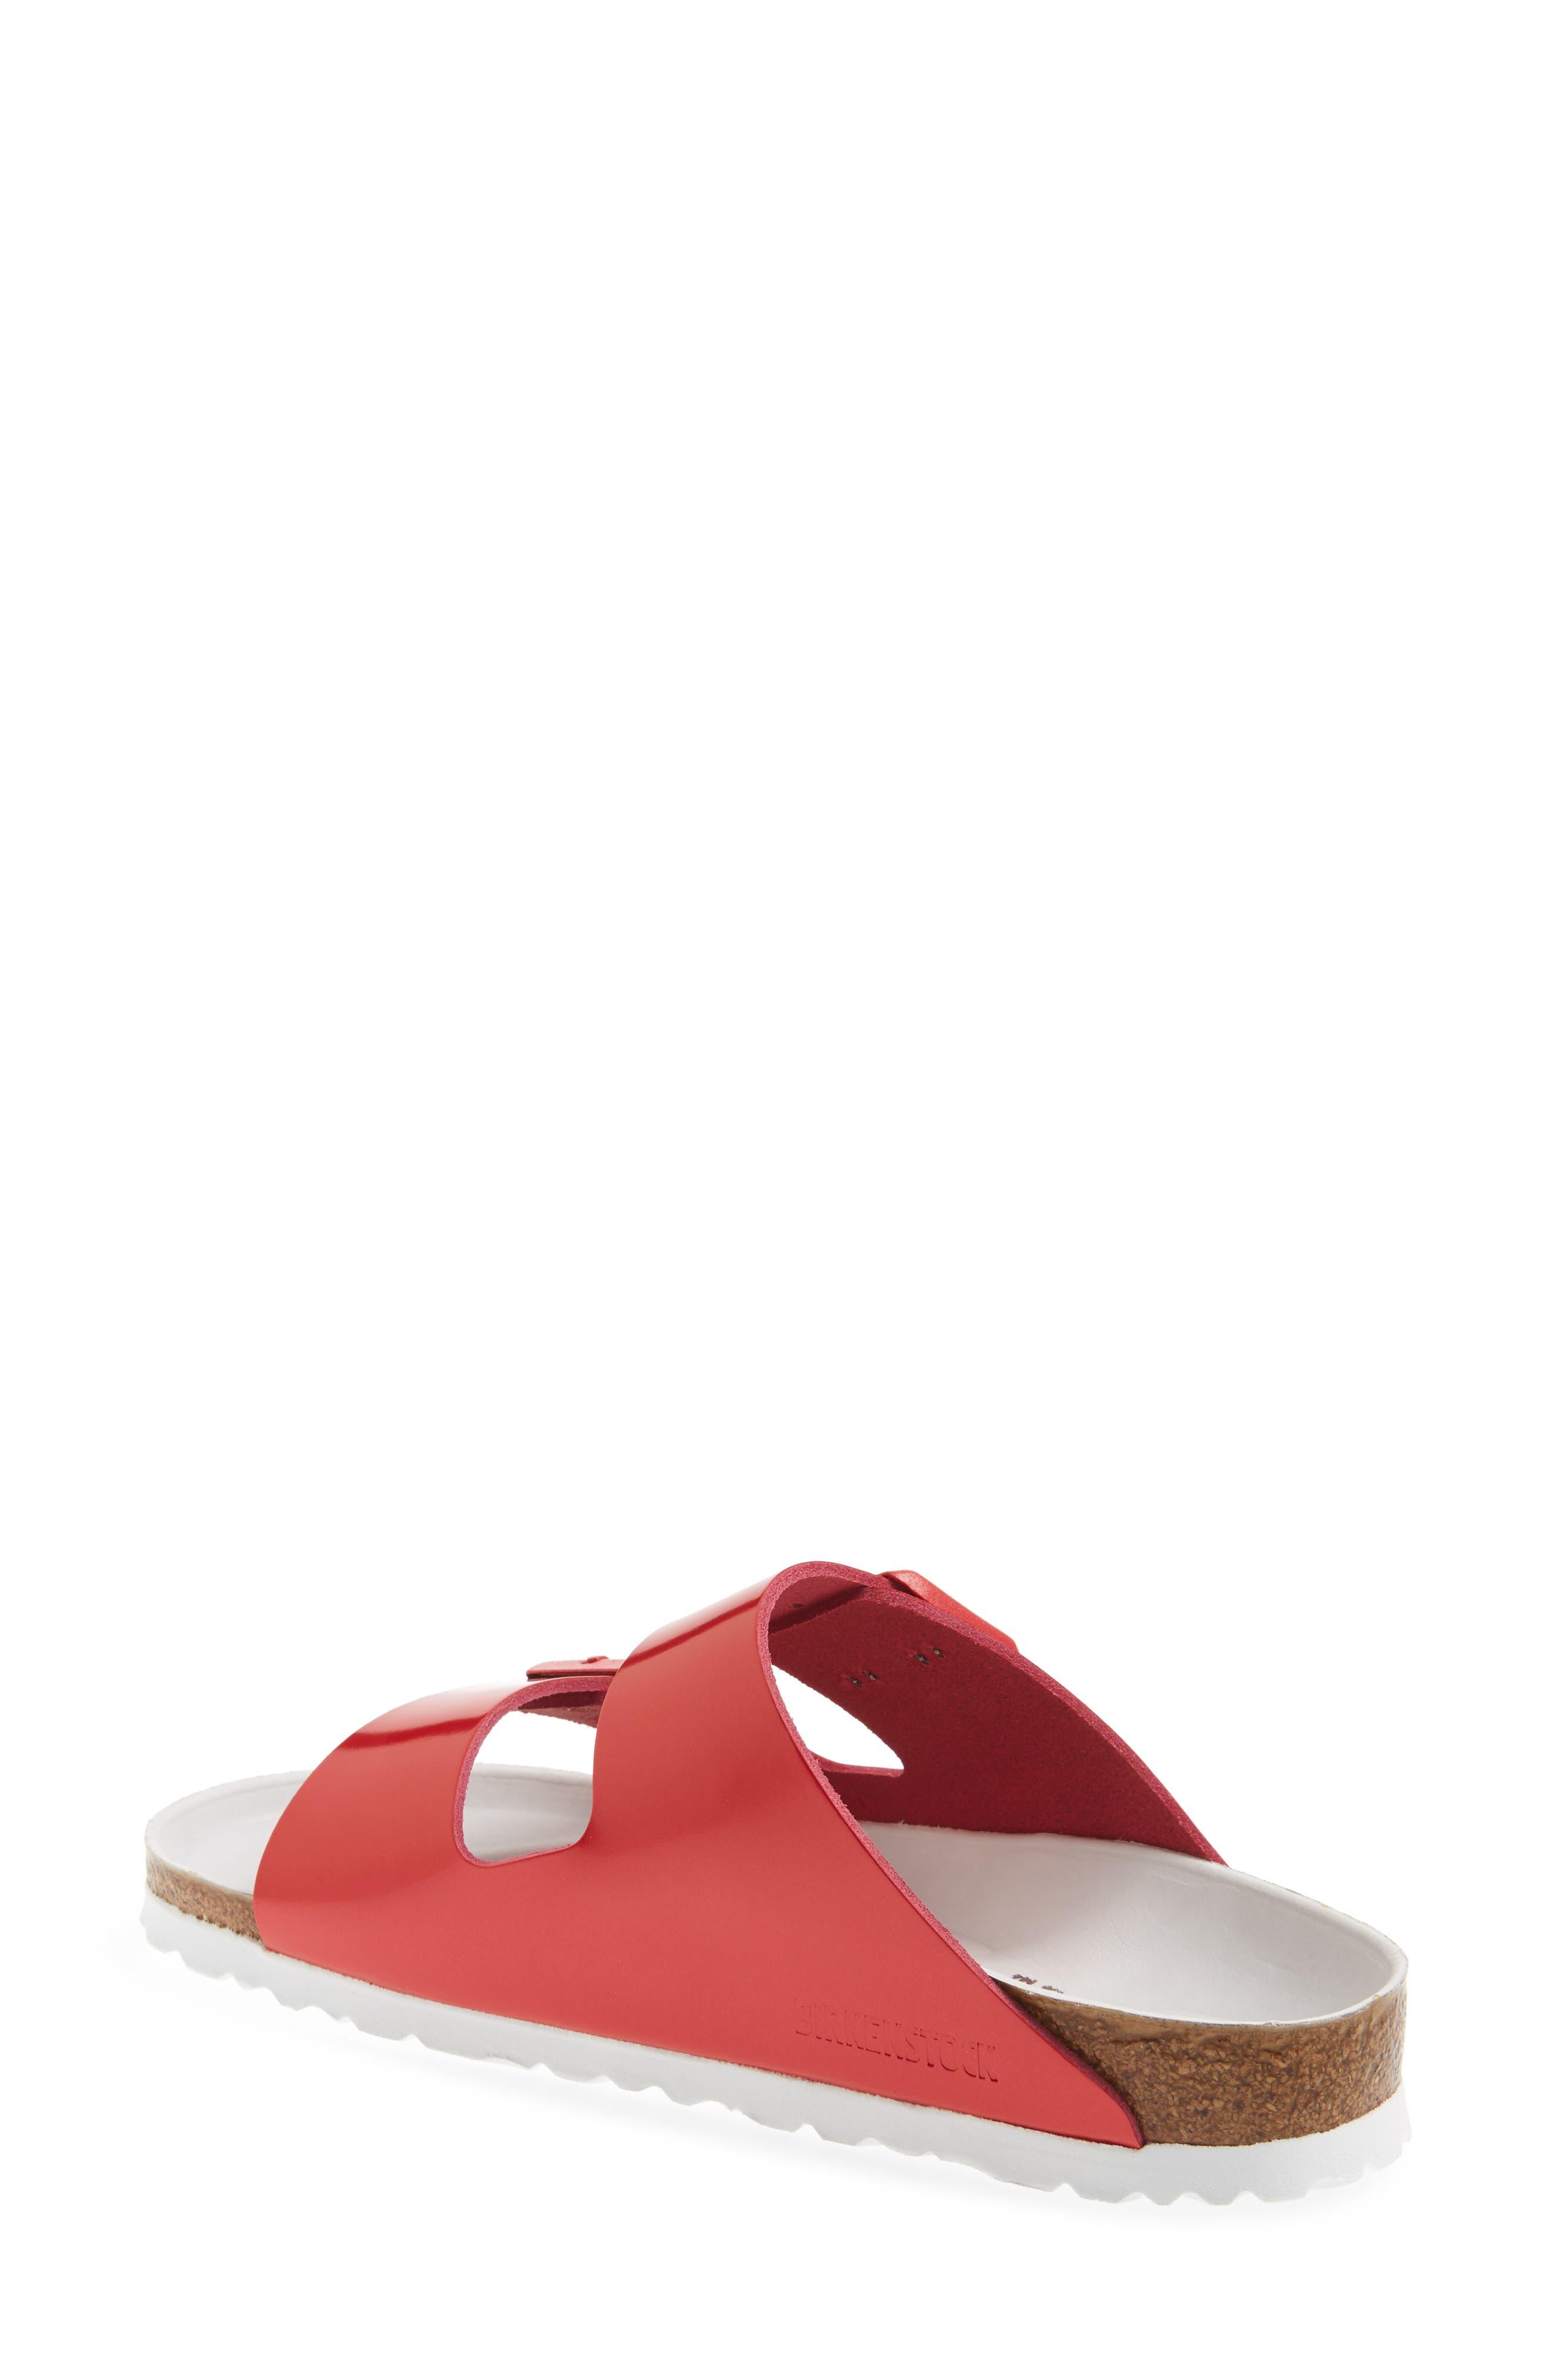 Alternate Image 2  - Birkenstock Arizona Hex Limited Edition - Shock Drop Slide Sandal (Women)